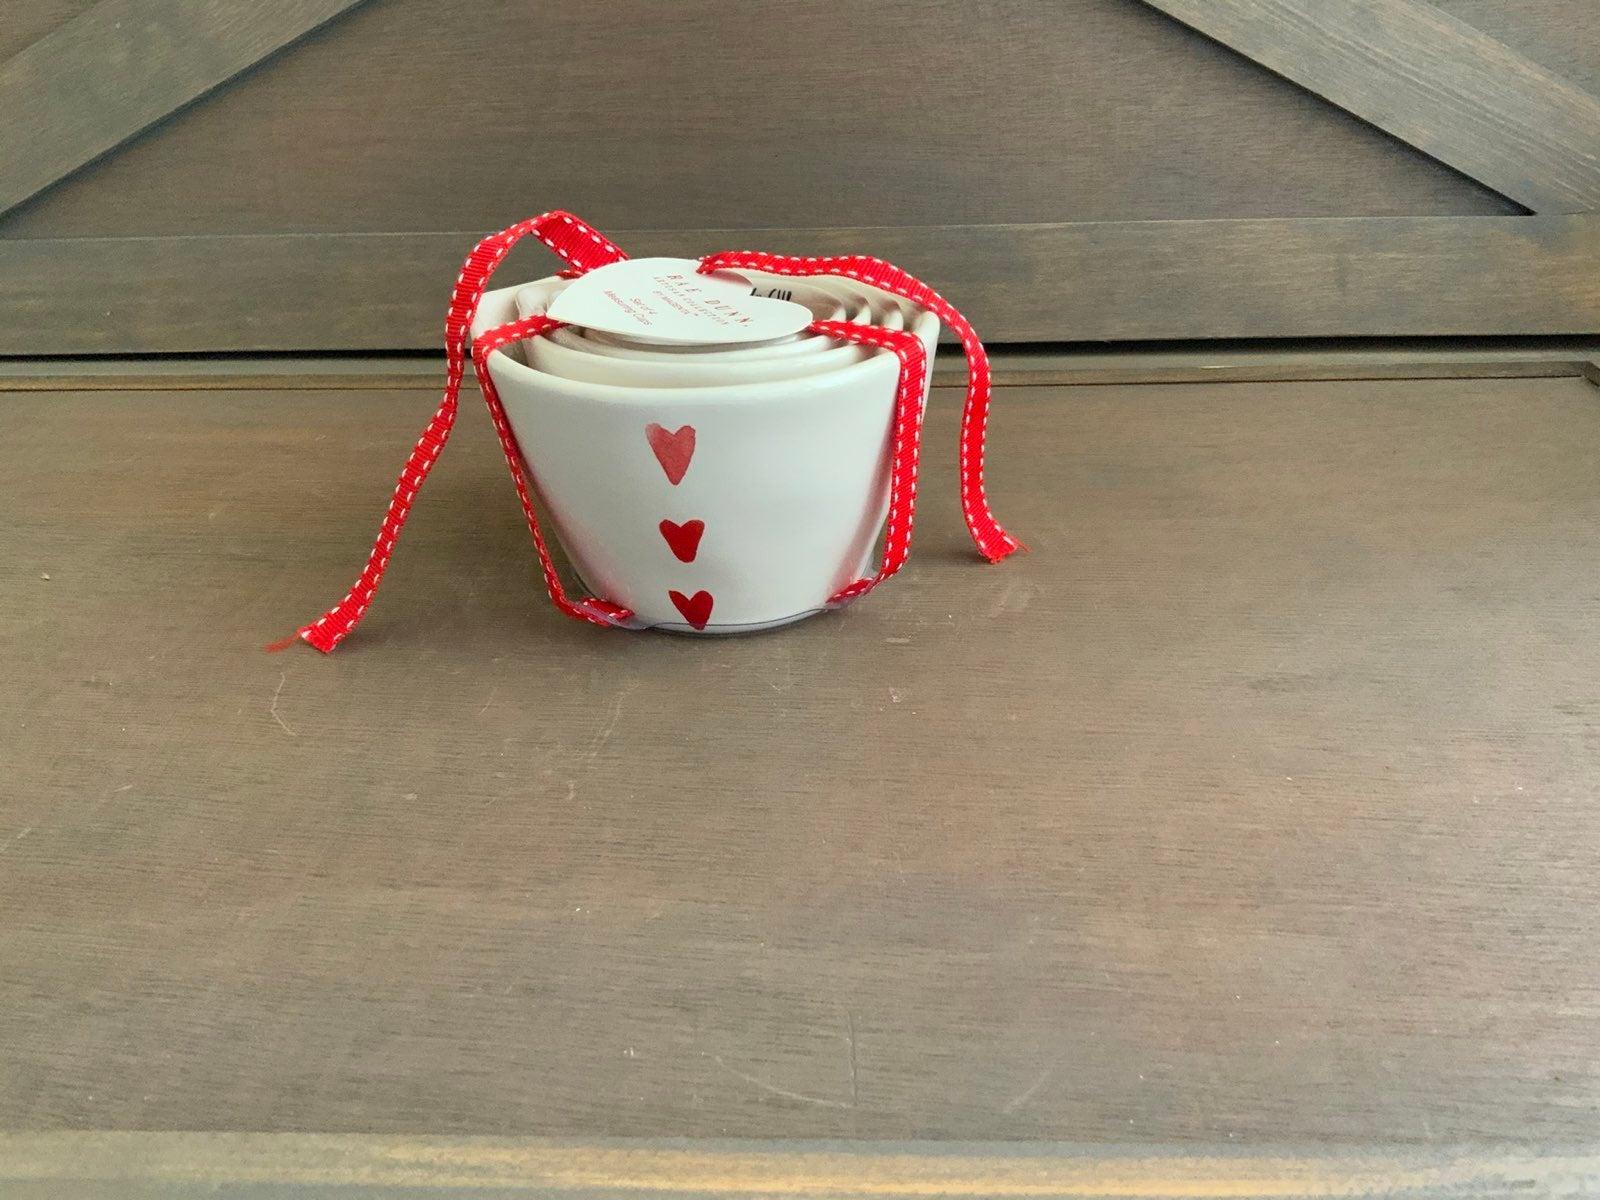 Rae dunn heart measuring cups